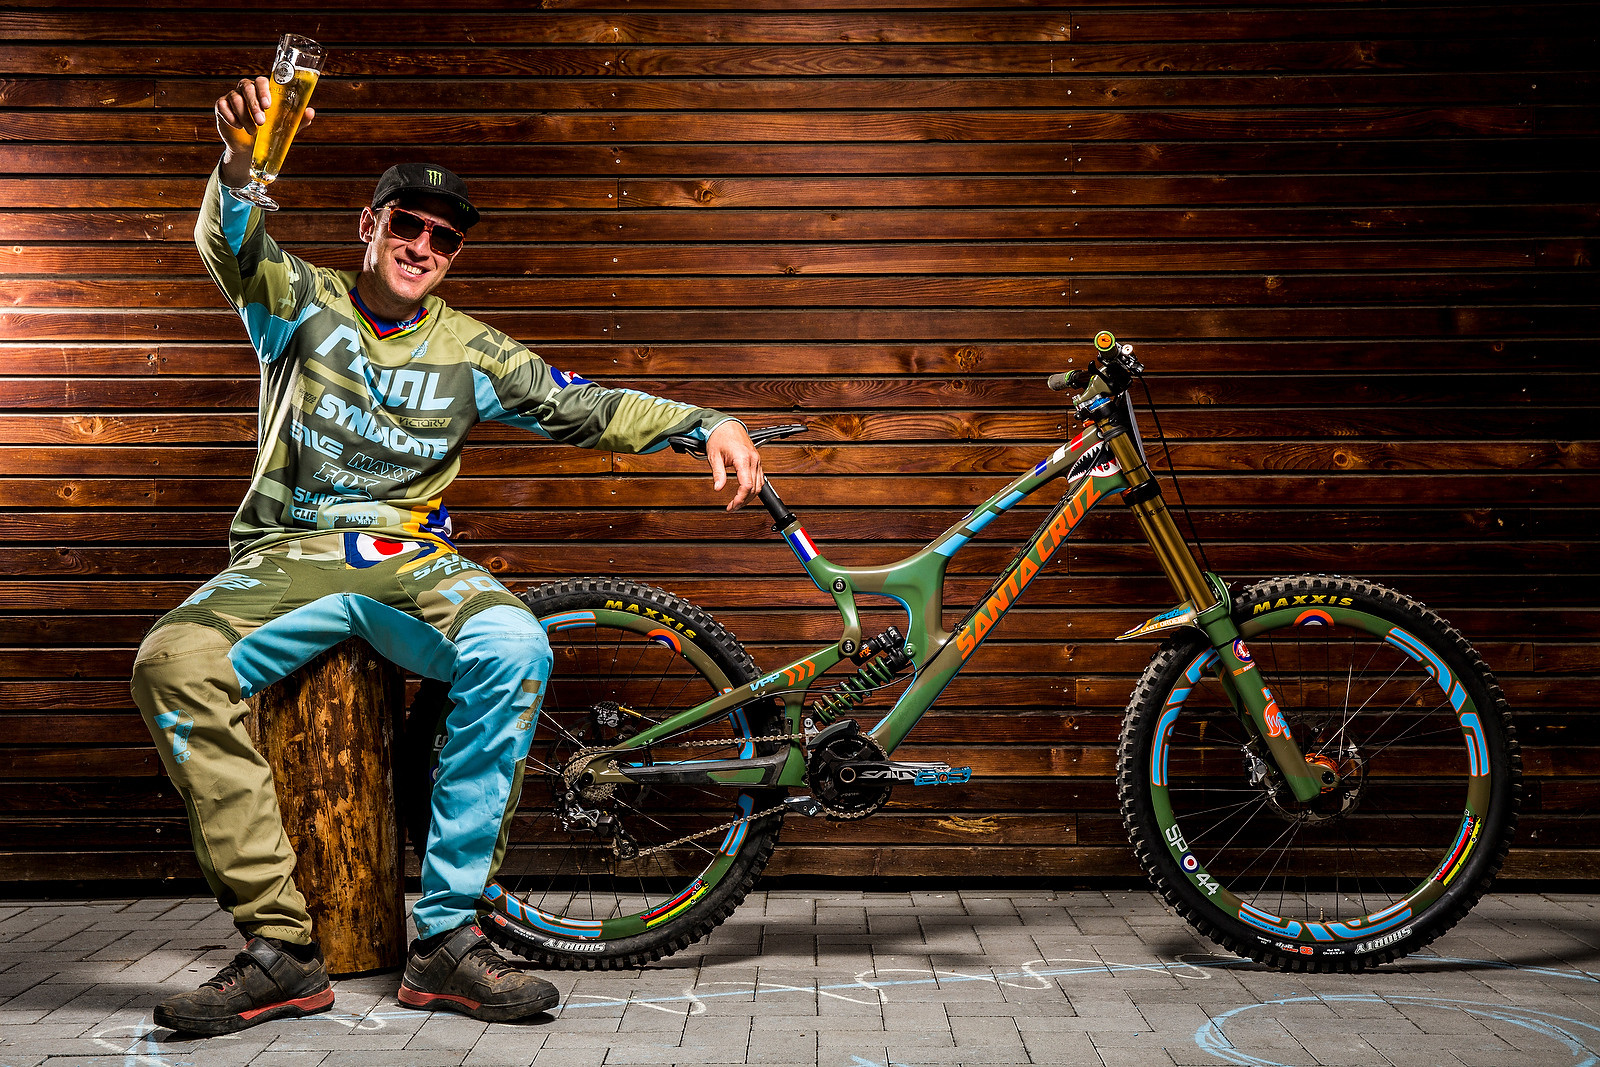 #allhailpeaty - PIT BITS & BIKES - 2016 World Champs - Mountain Biking Pictures - Vital MTB